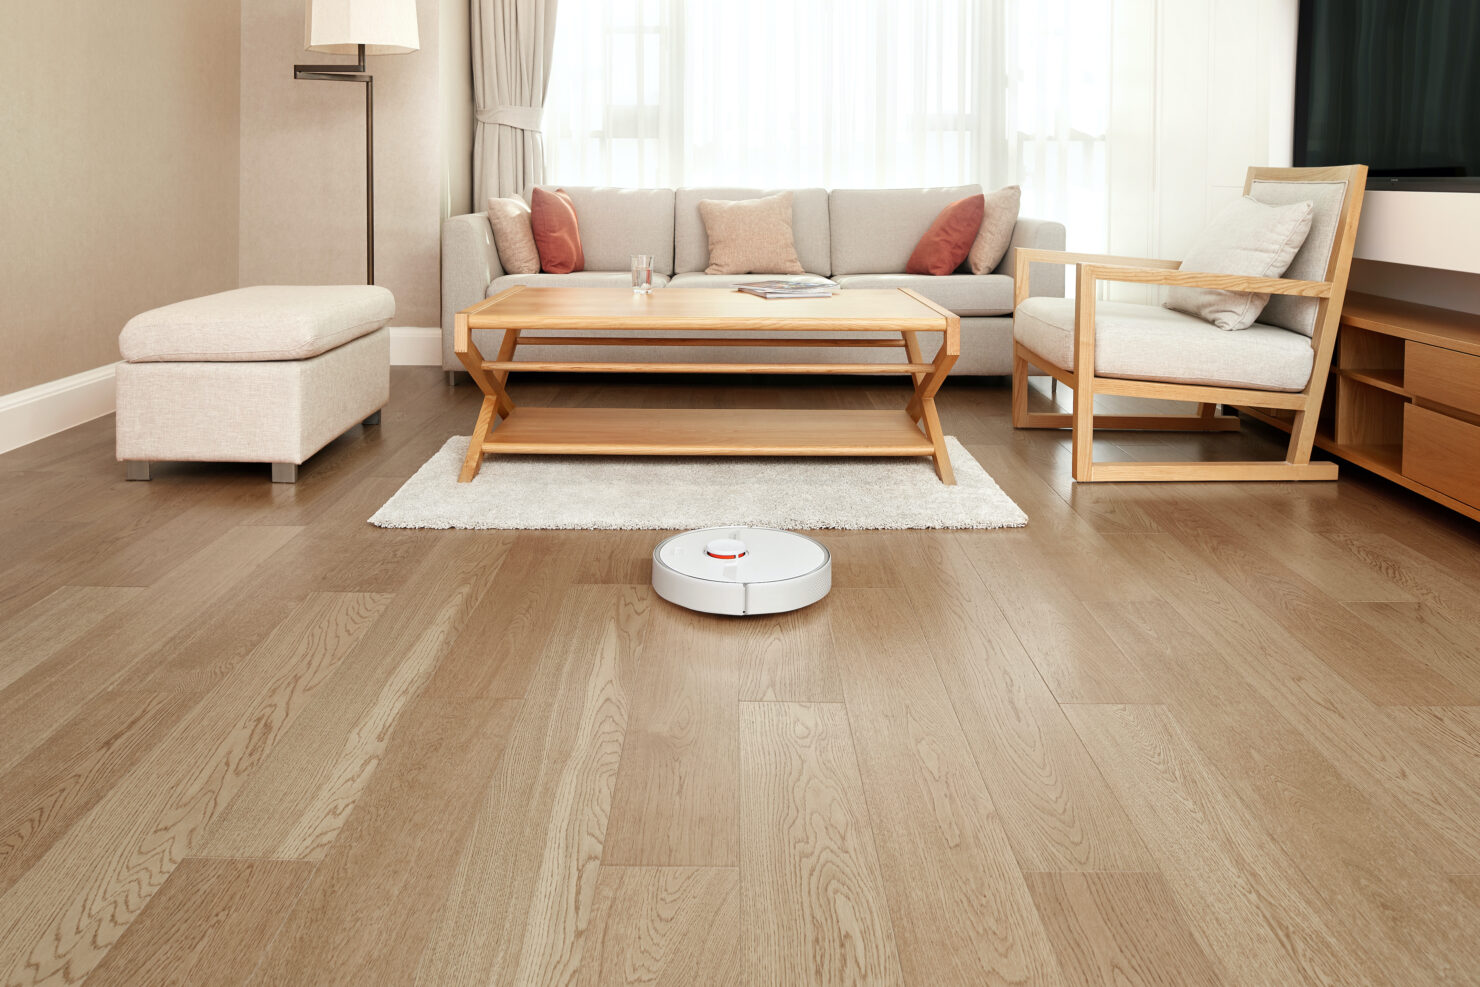 roborock s6 pure smart vacuum cleaner